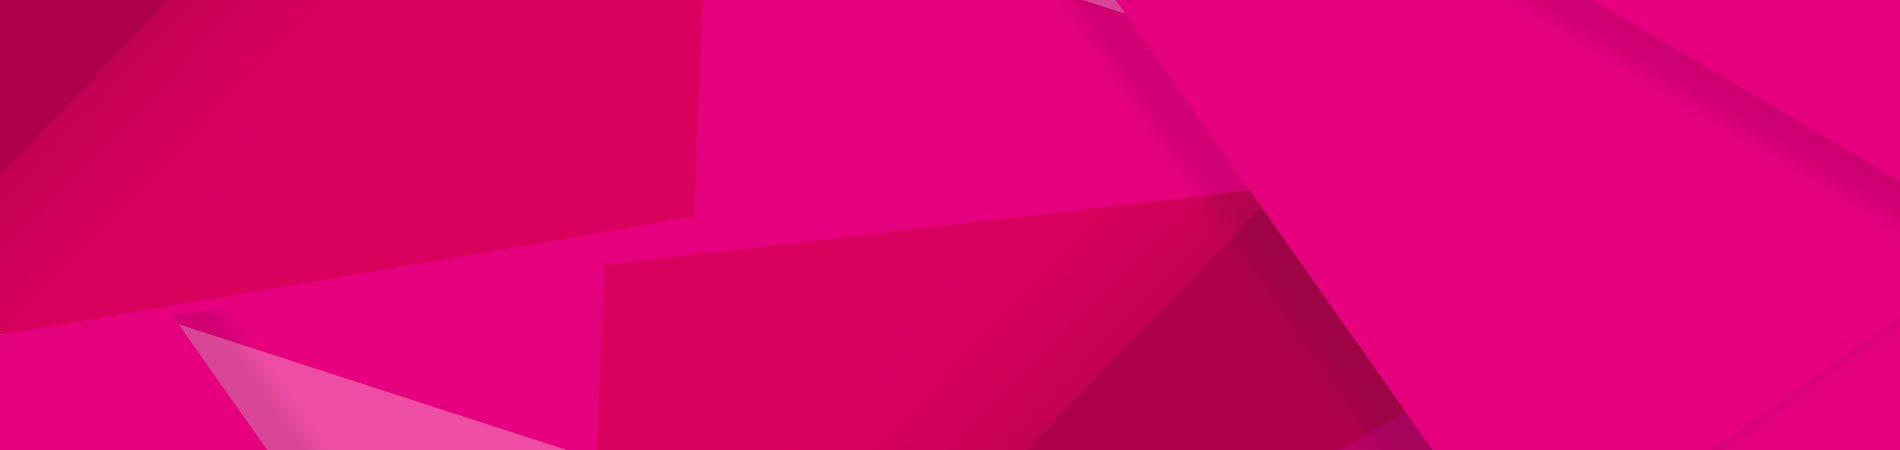 geometric background image pink